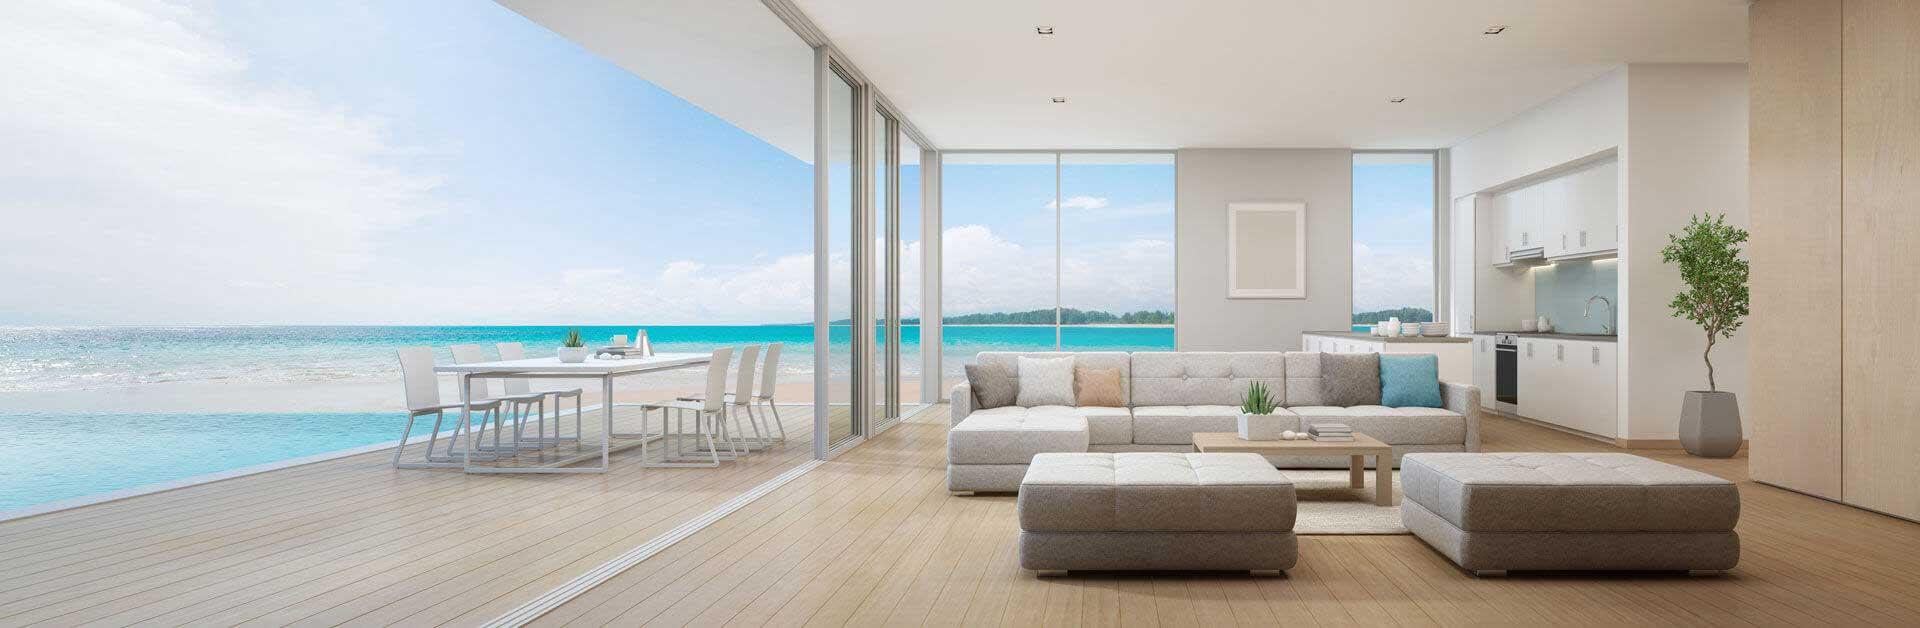 Global Luxury Vacation Rental Banner